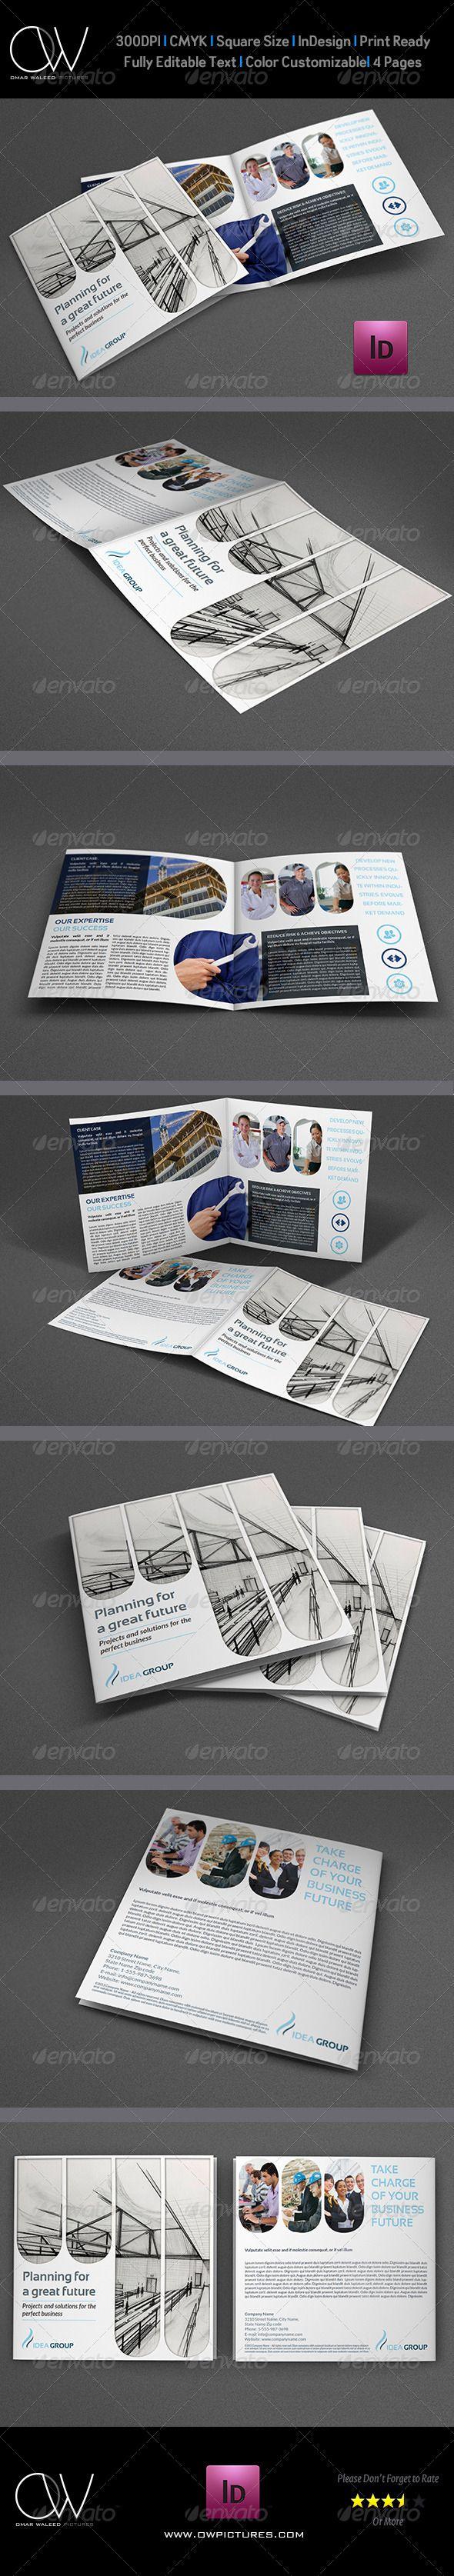 84 best Bi-Fold Brochure images on Pinterest   Brochure template ...